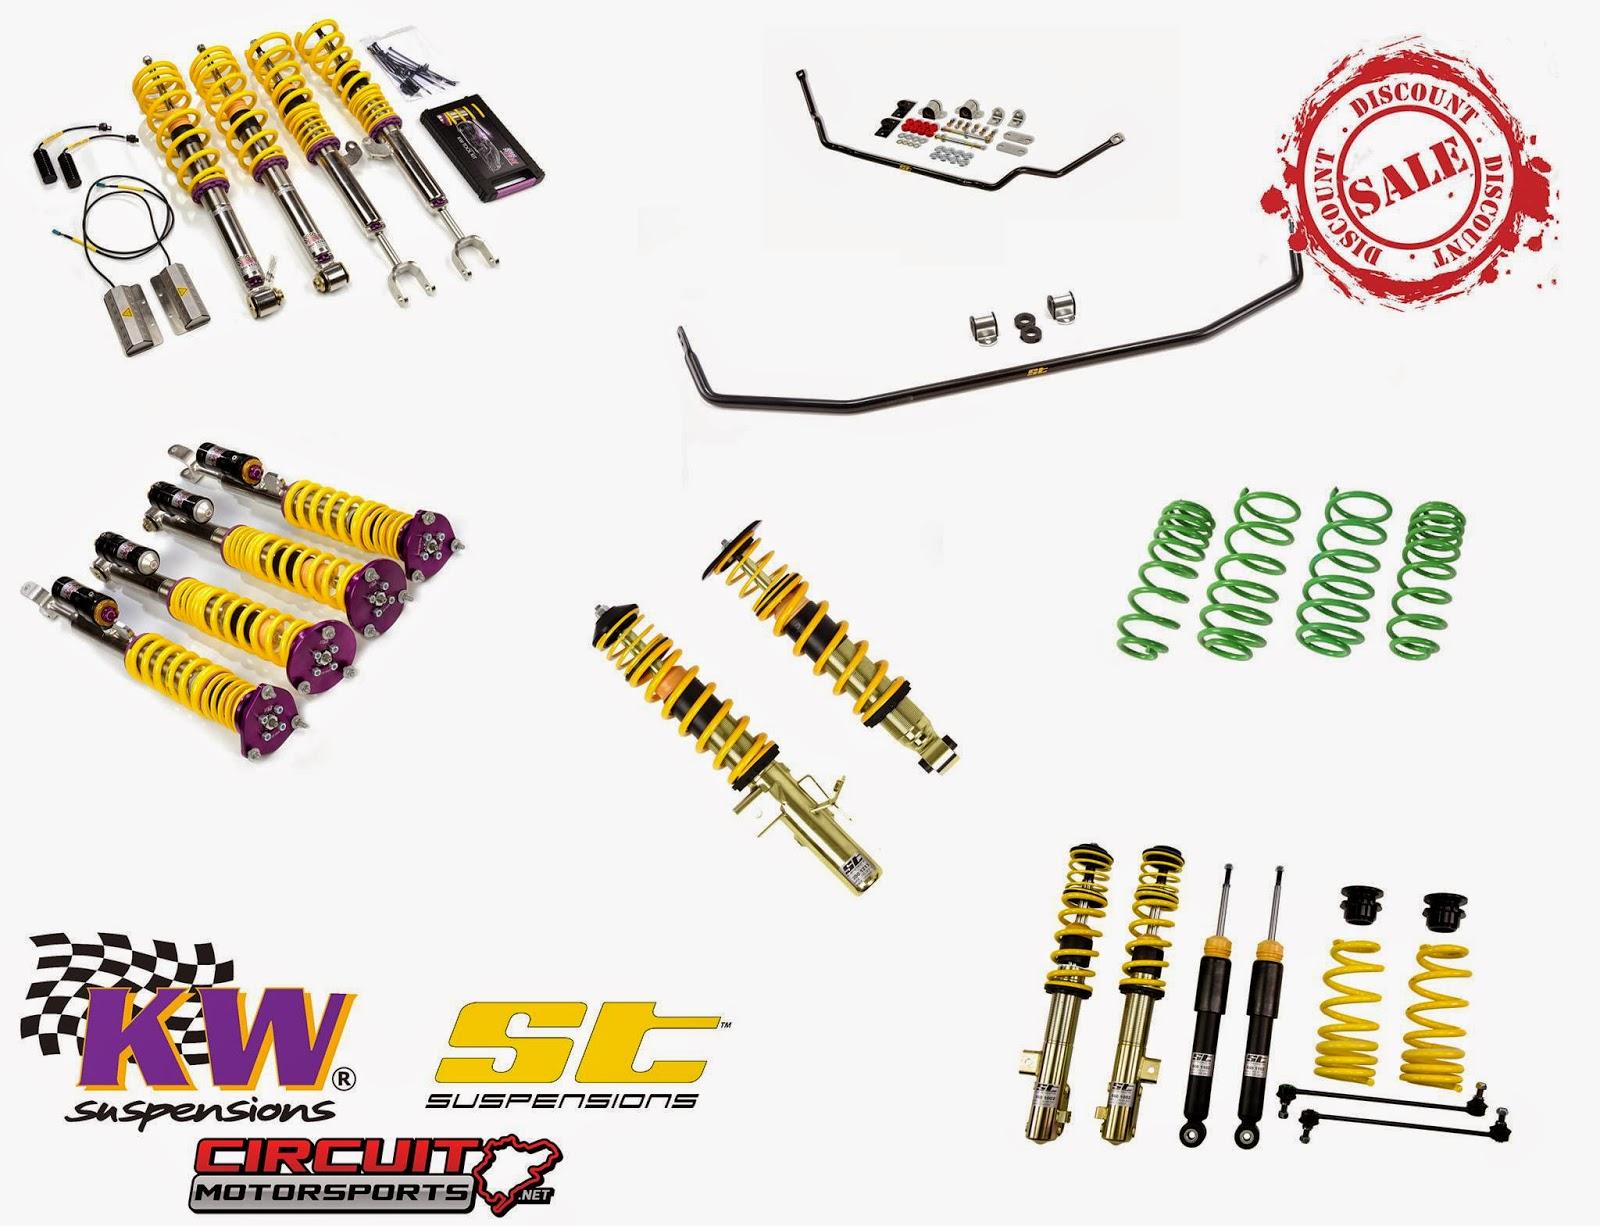 http://www.circuitmotorsports.net/